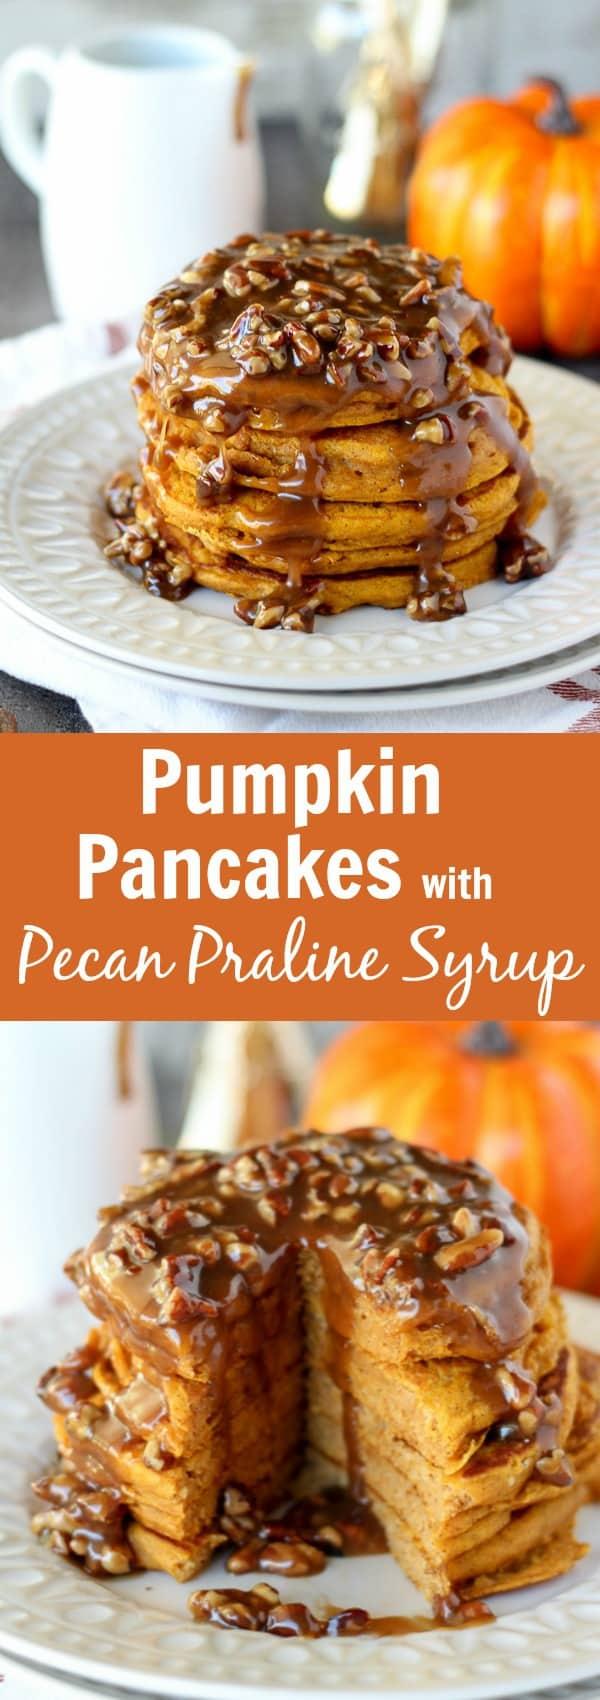 Pumpkin Pancakes with Pecan Praline Syrup